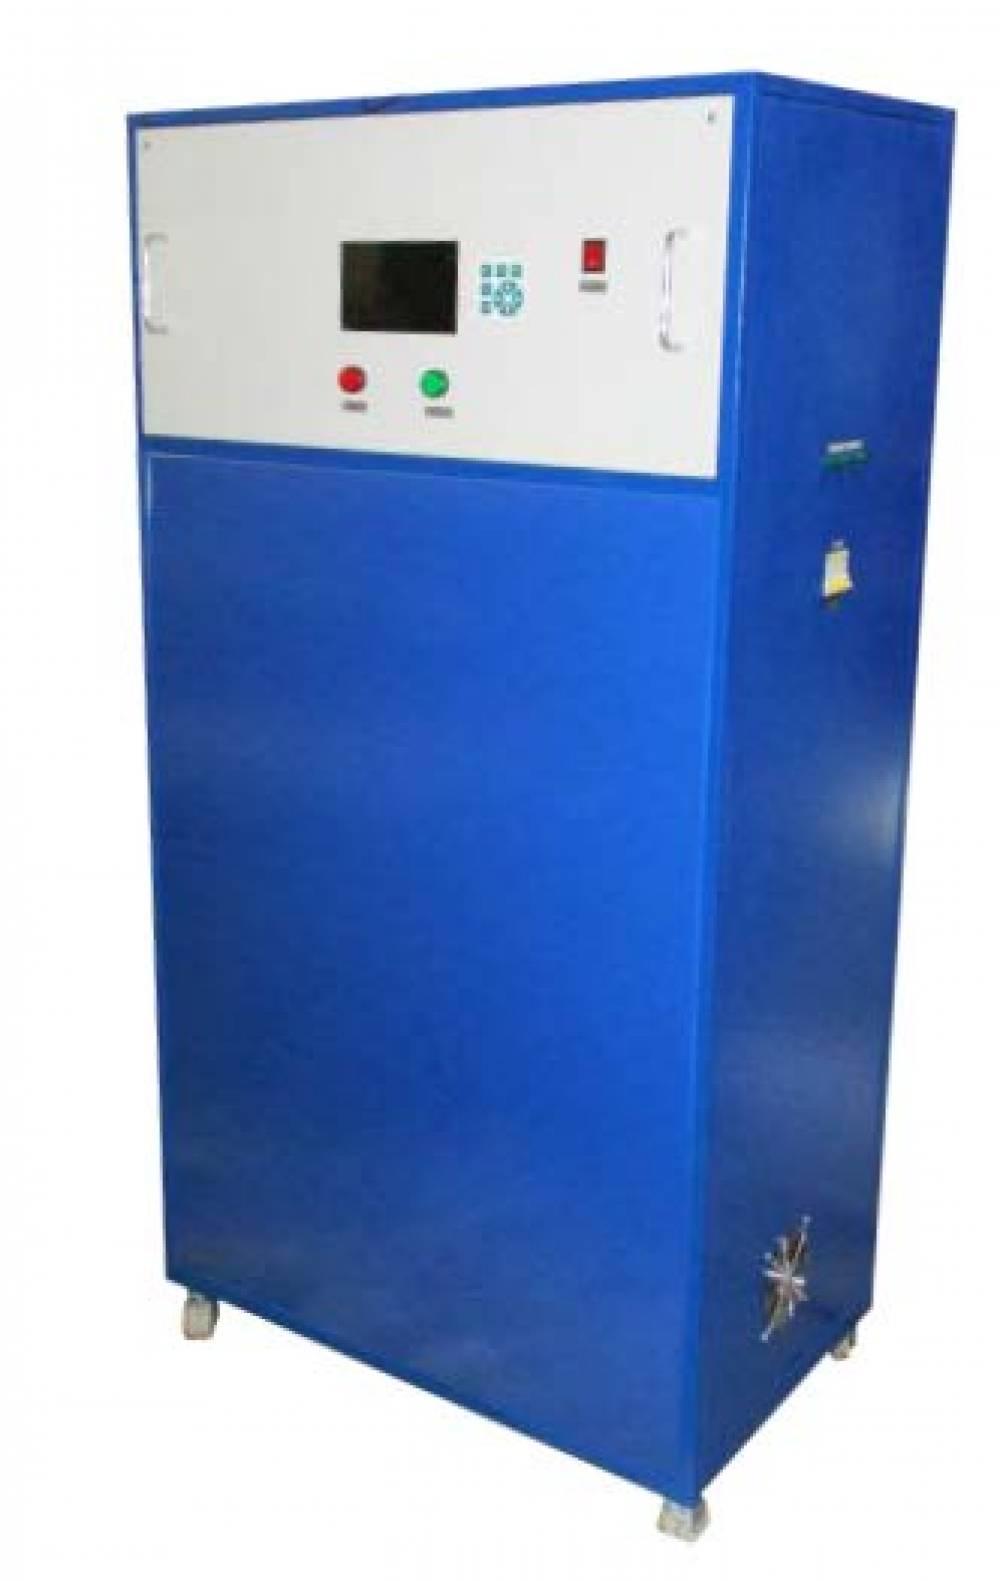 АЗРУ Автоматическое зарядно-разрядное устройство (ФУРС. 435211.007)